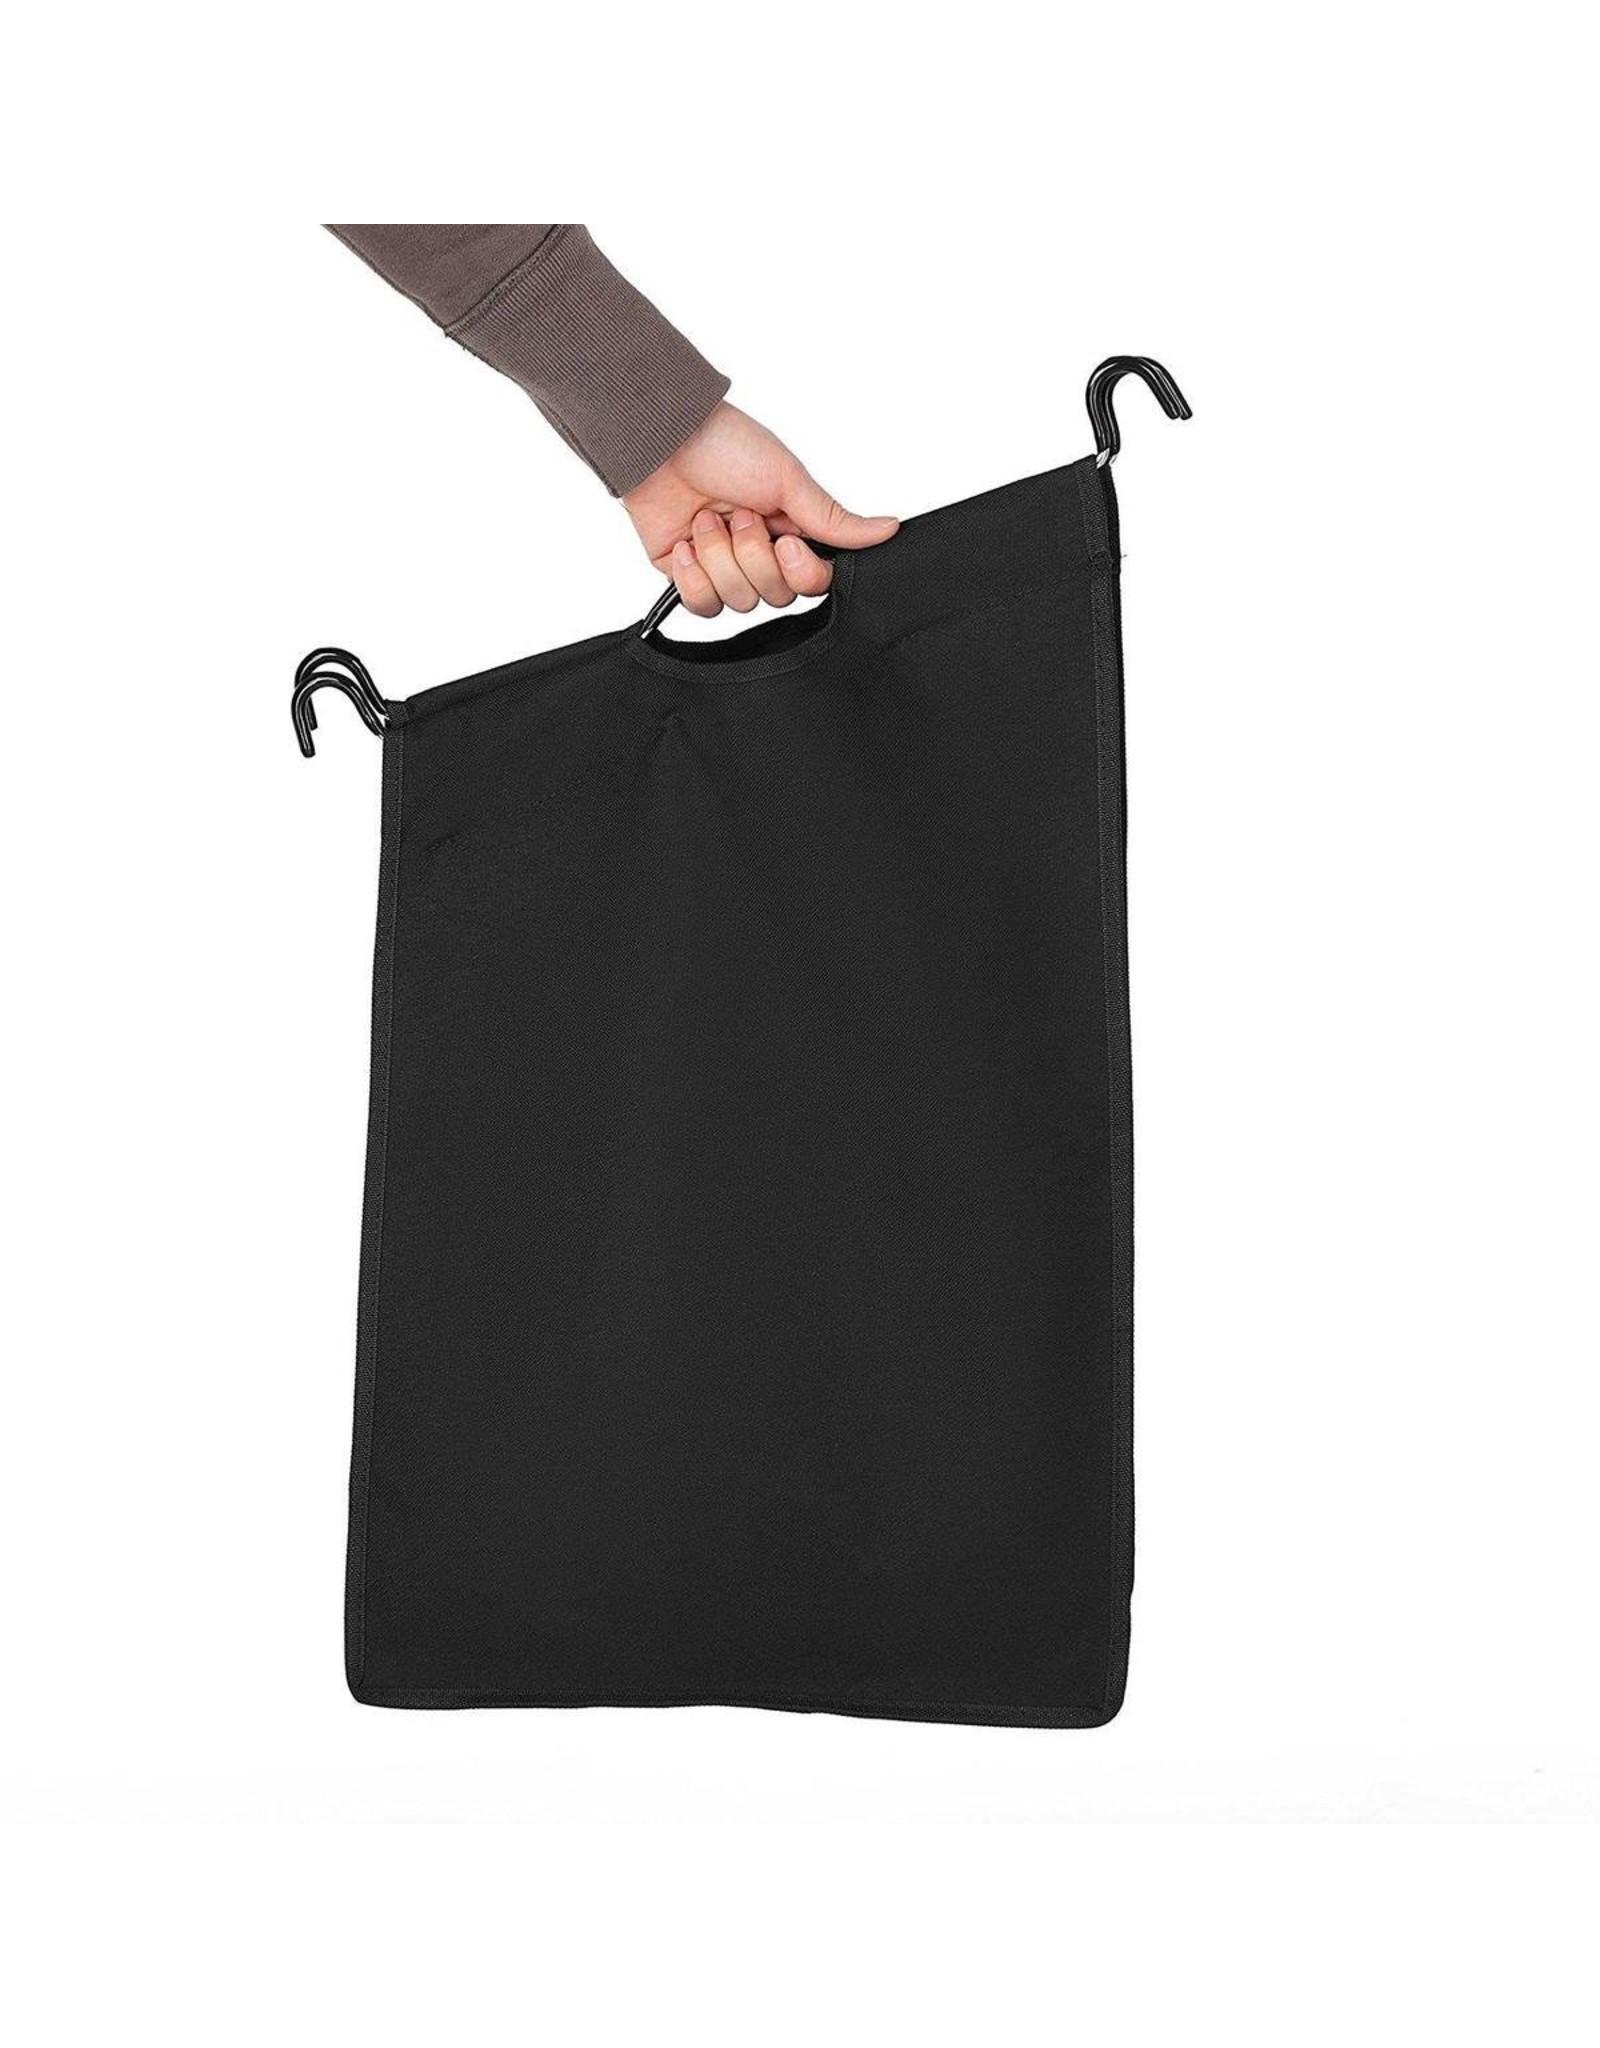 Parya Home Parya Home - Laundry basket on wheels - 4 Laundry bags